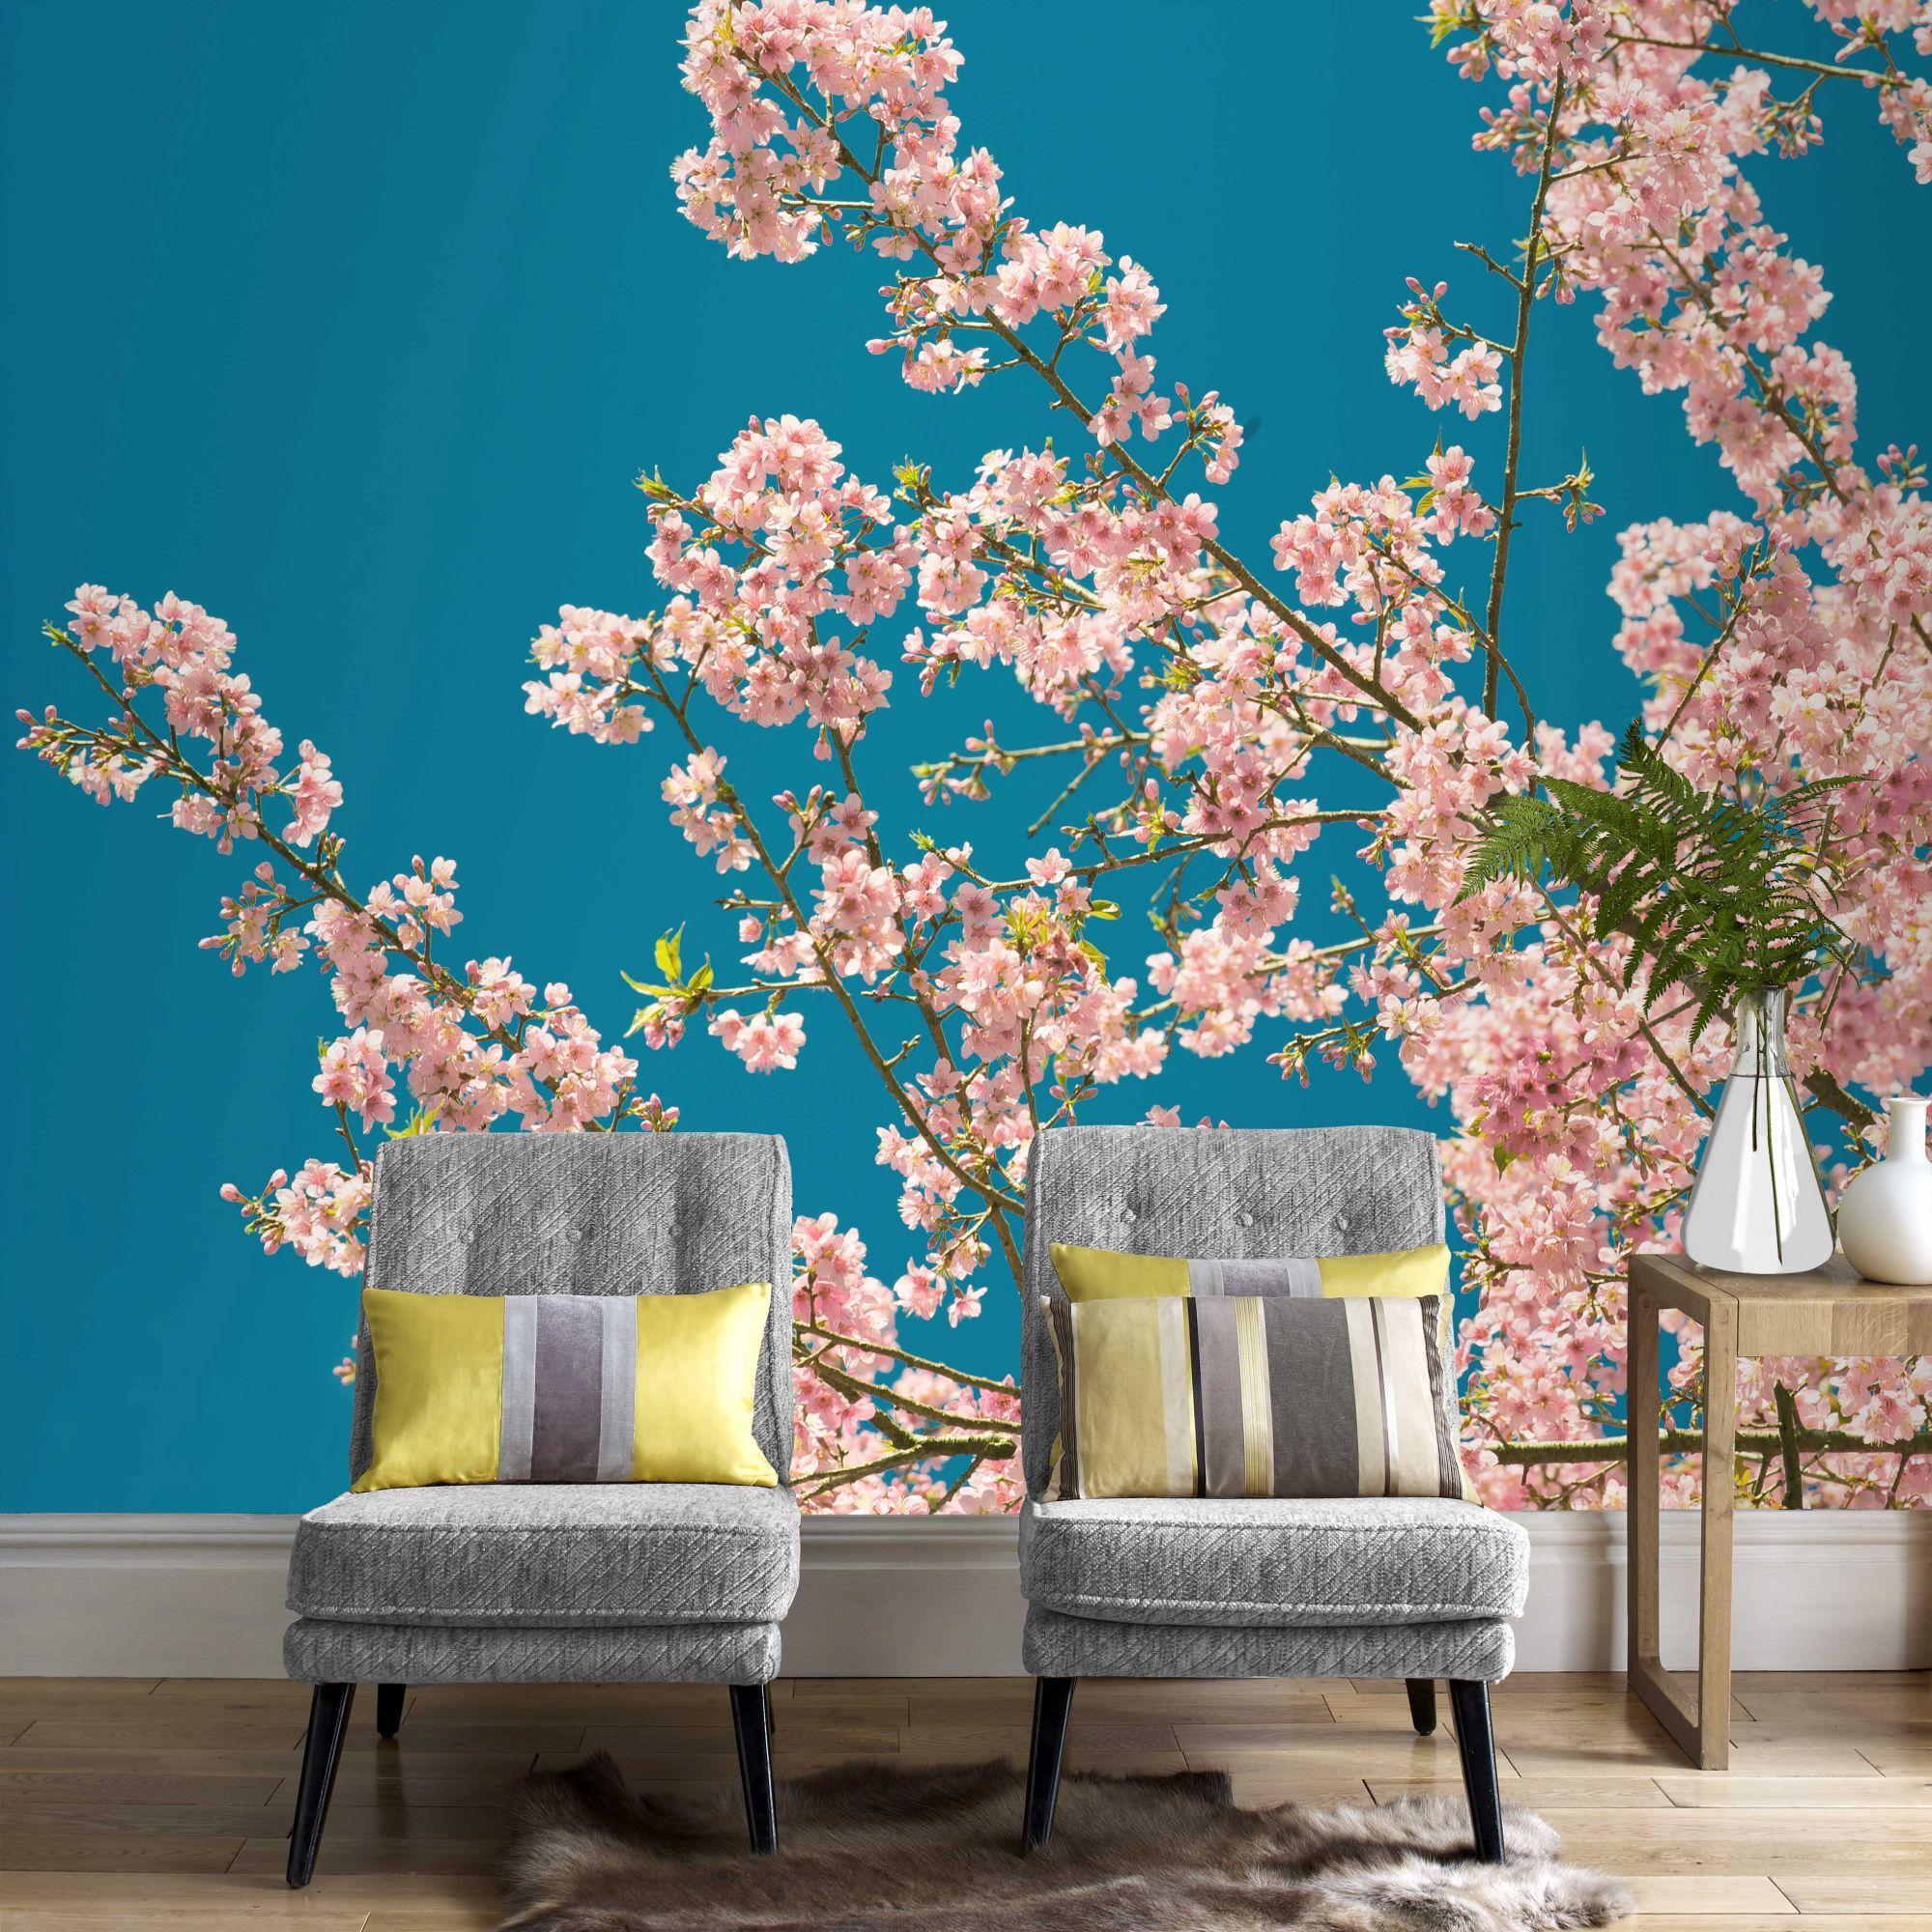 Marvelous Cherry Blossom Wall Mural, ... Design Ideas